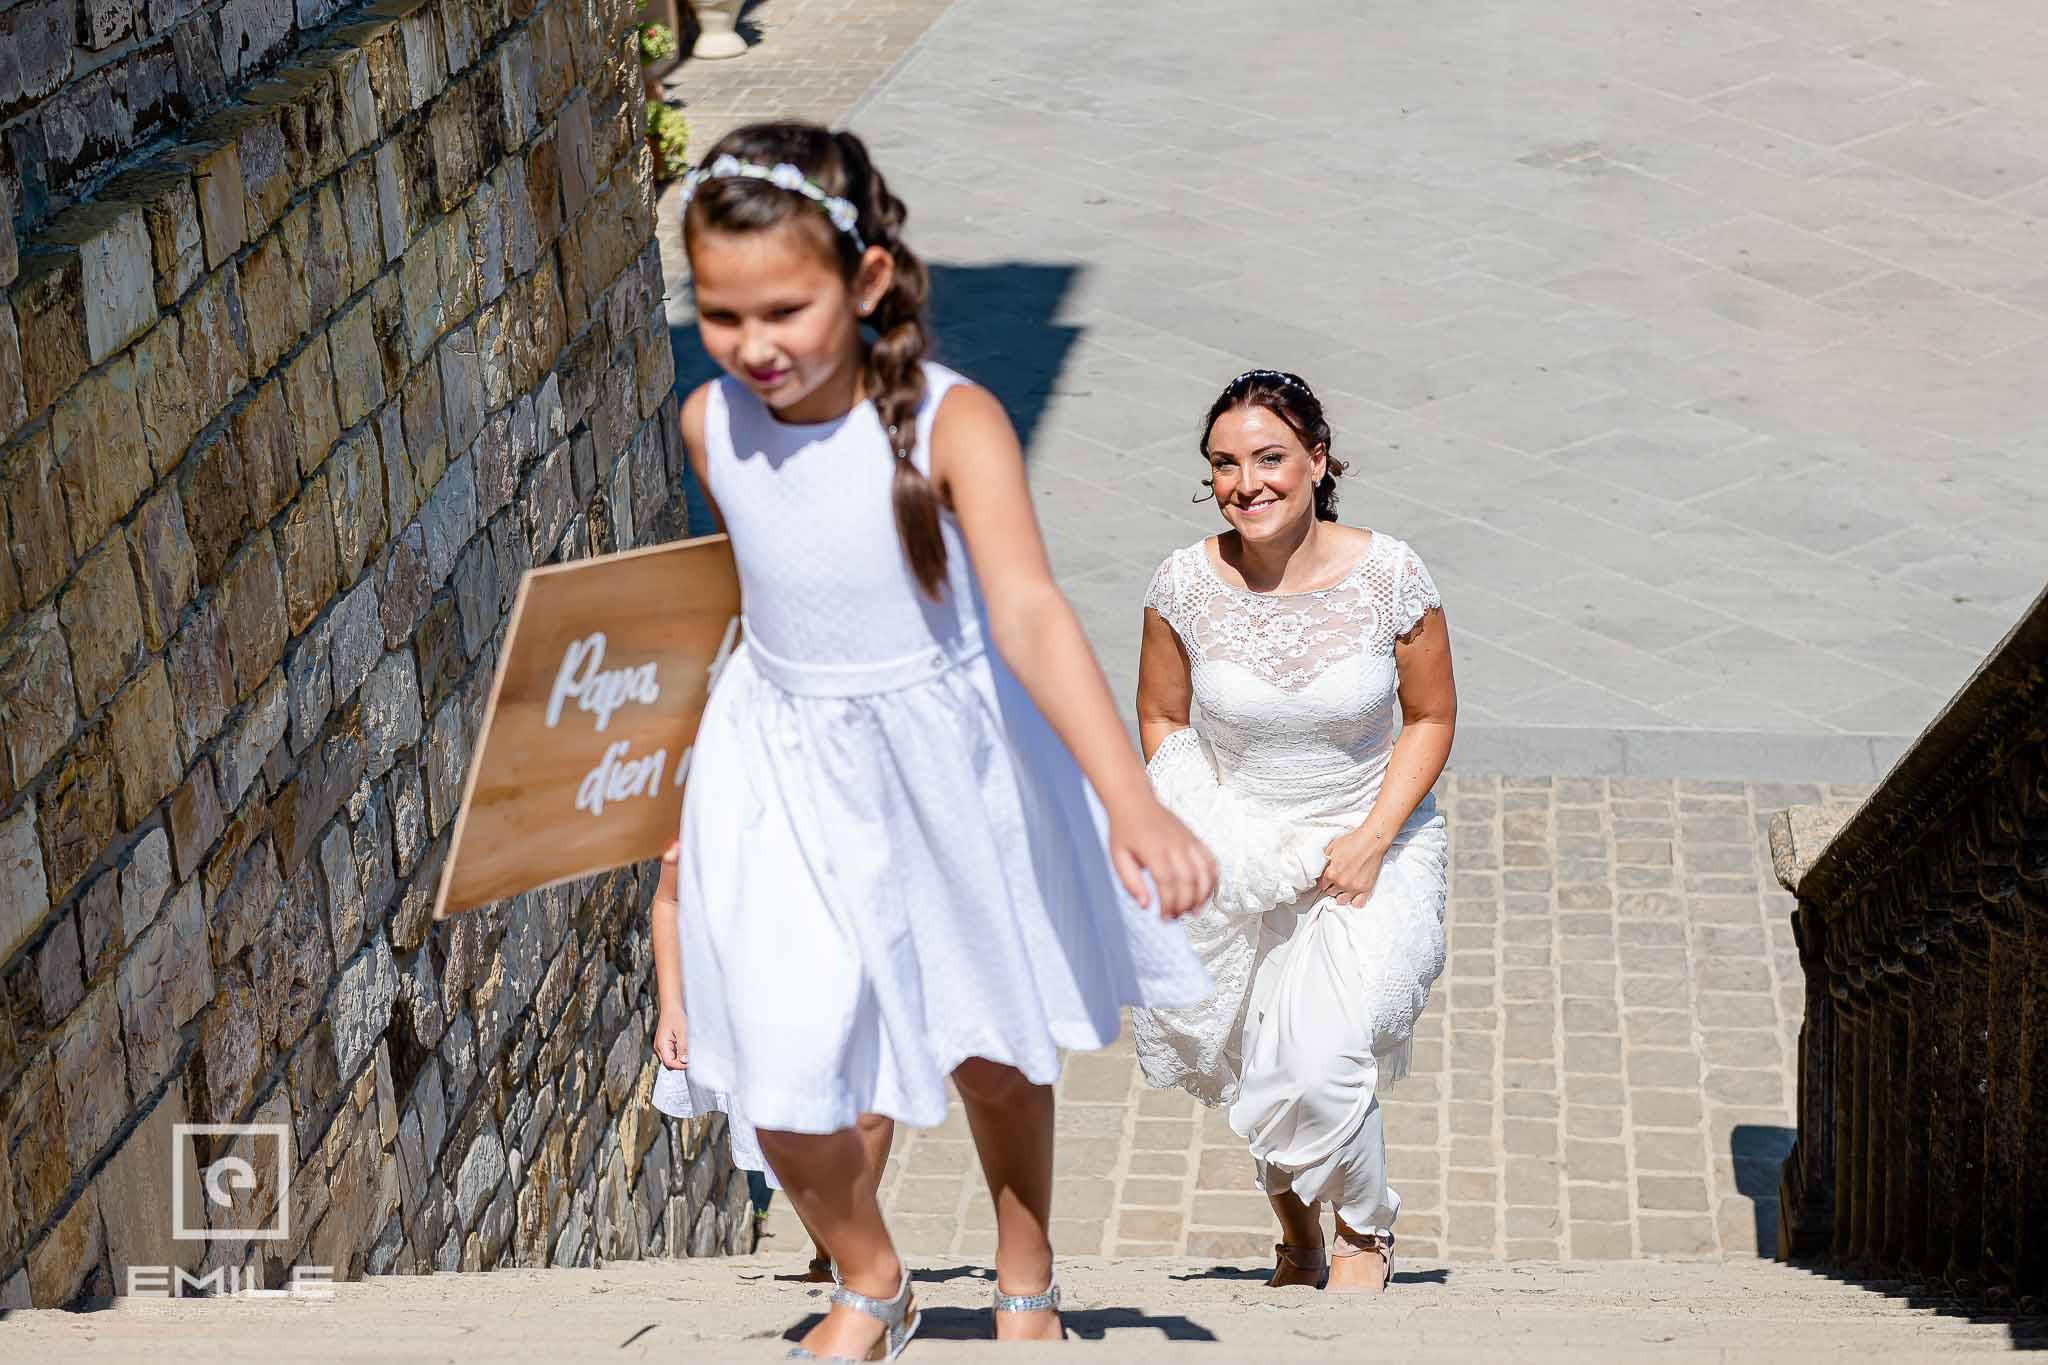 De bruid loopt de trappen op van de kerk - Destination wedding San Gimignano - Toscane Italie - Iris en Job